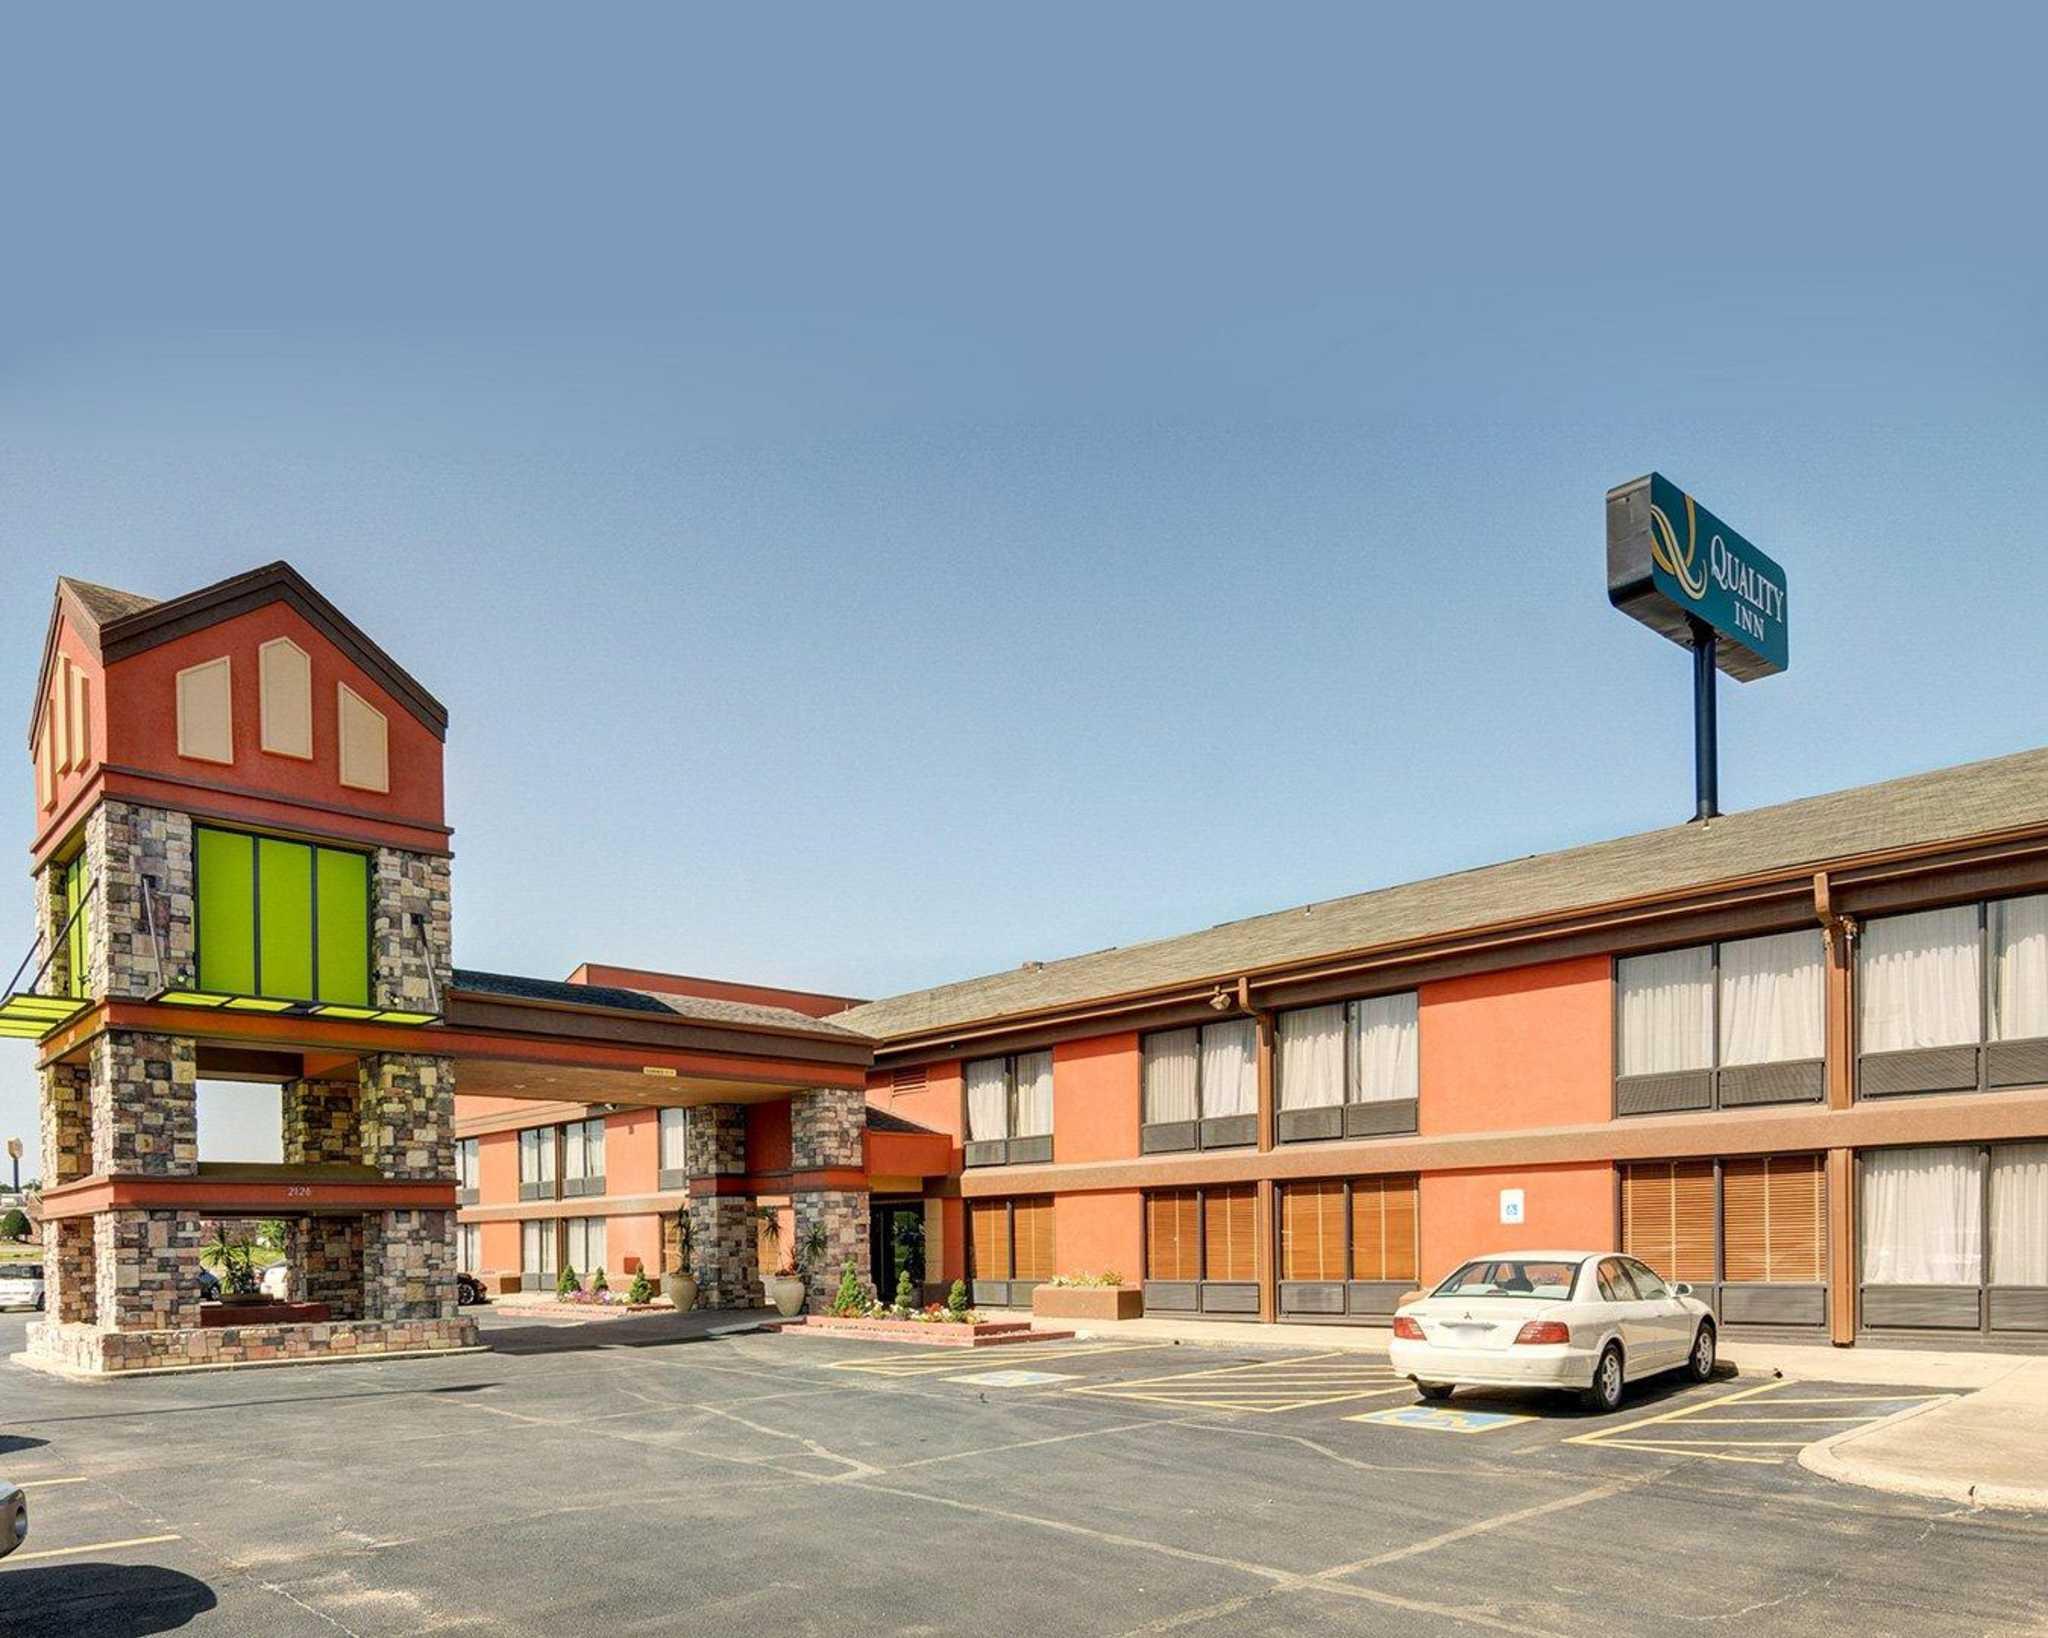 Quality Inn Fort Smith AR YP